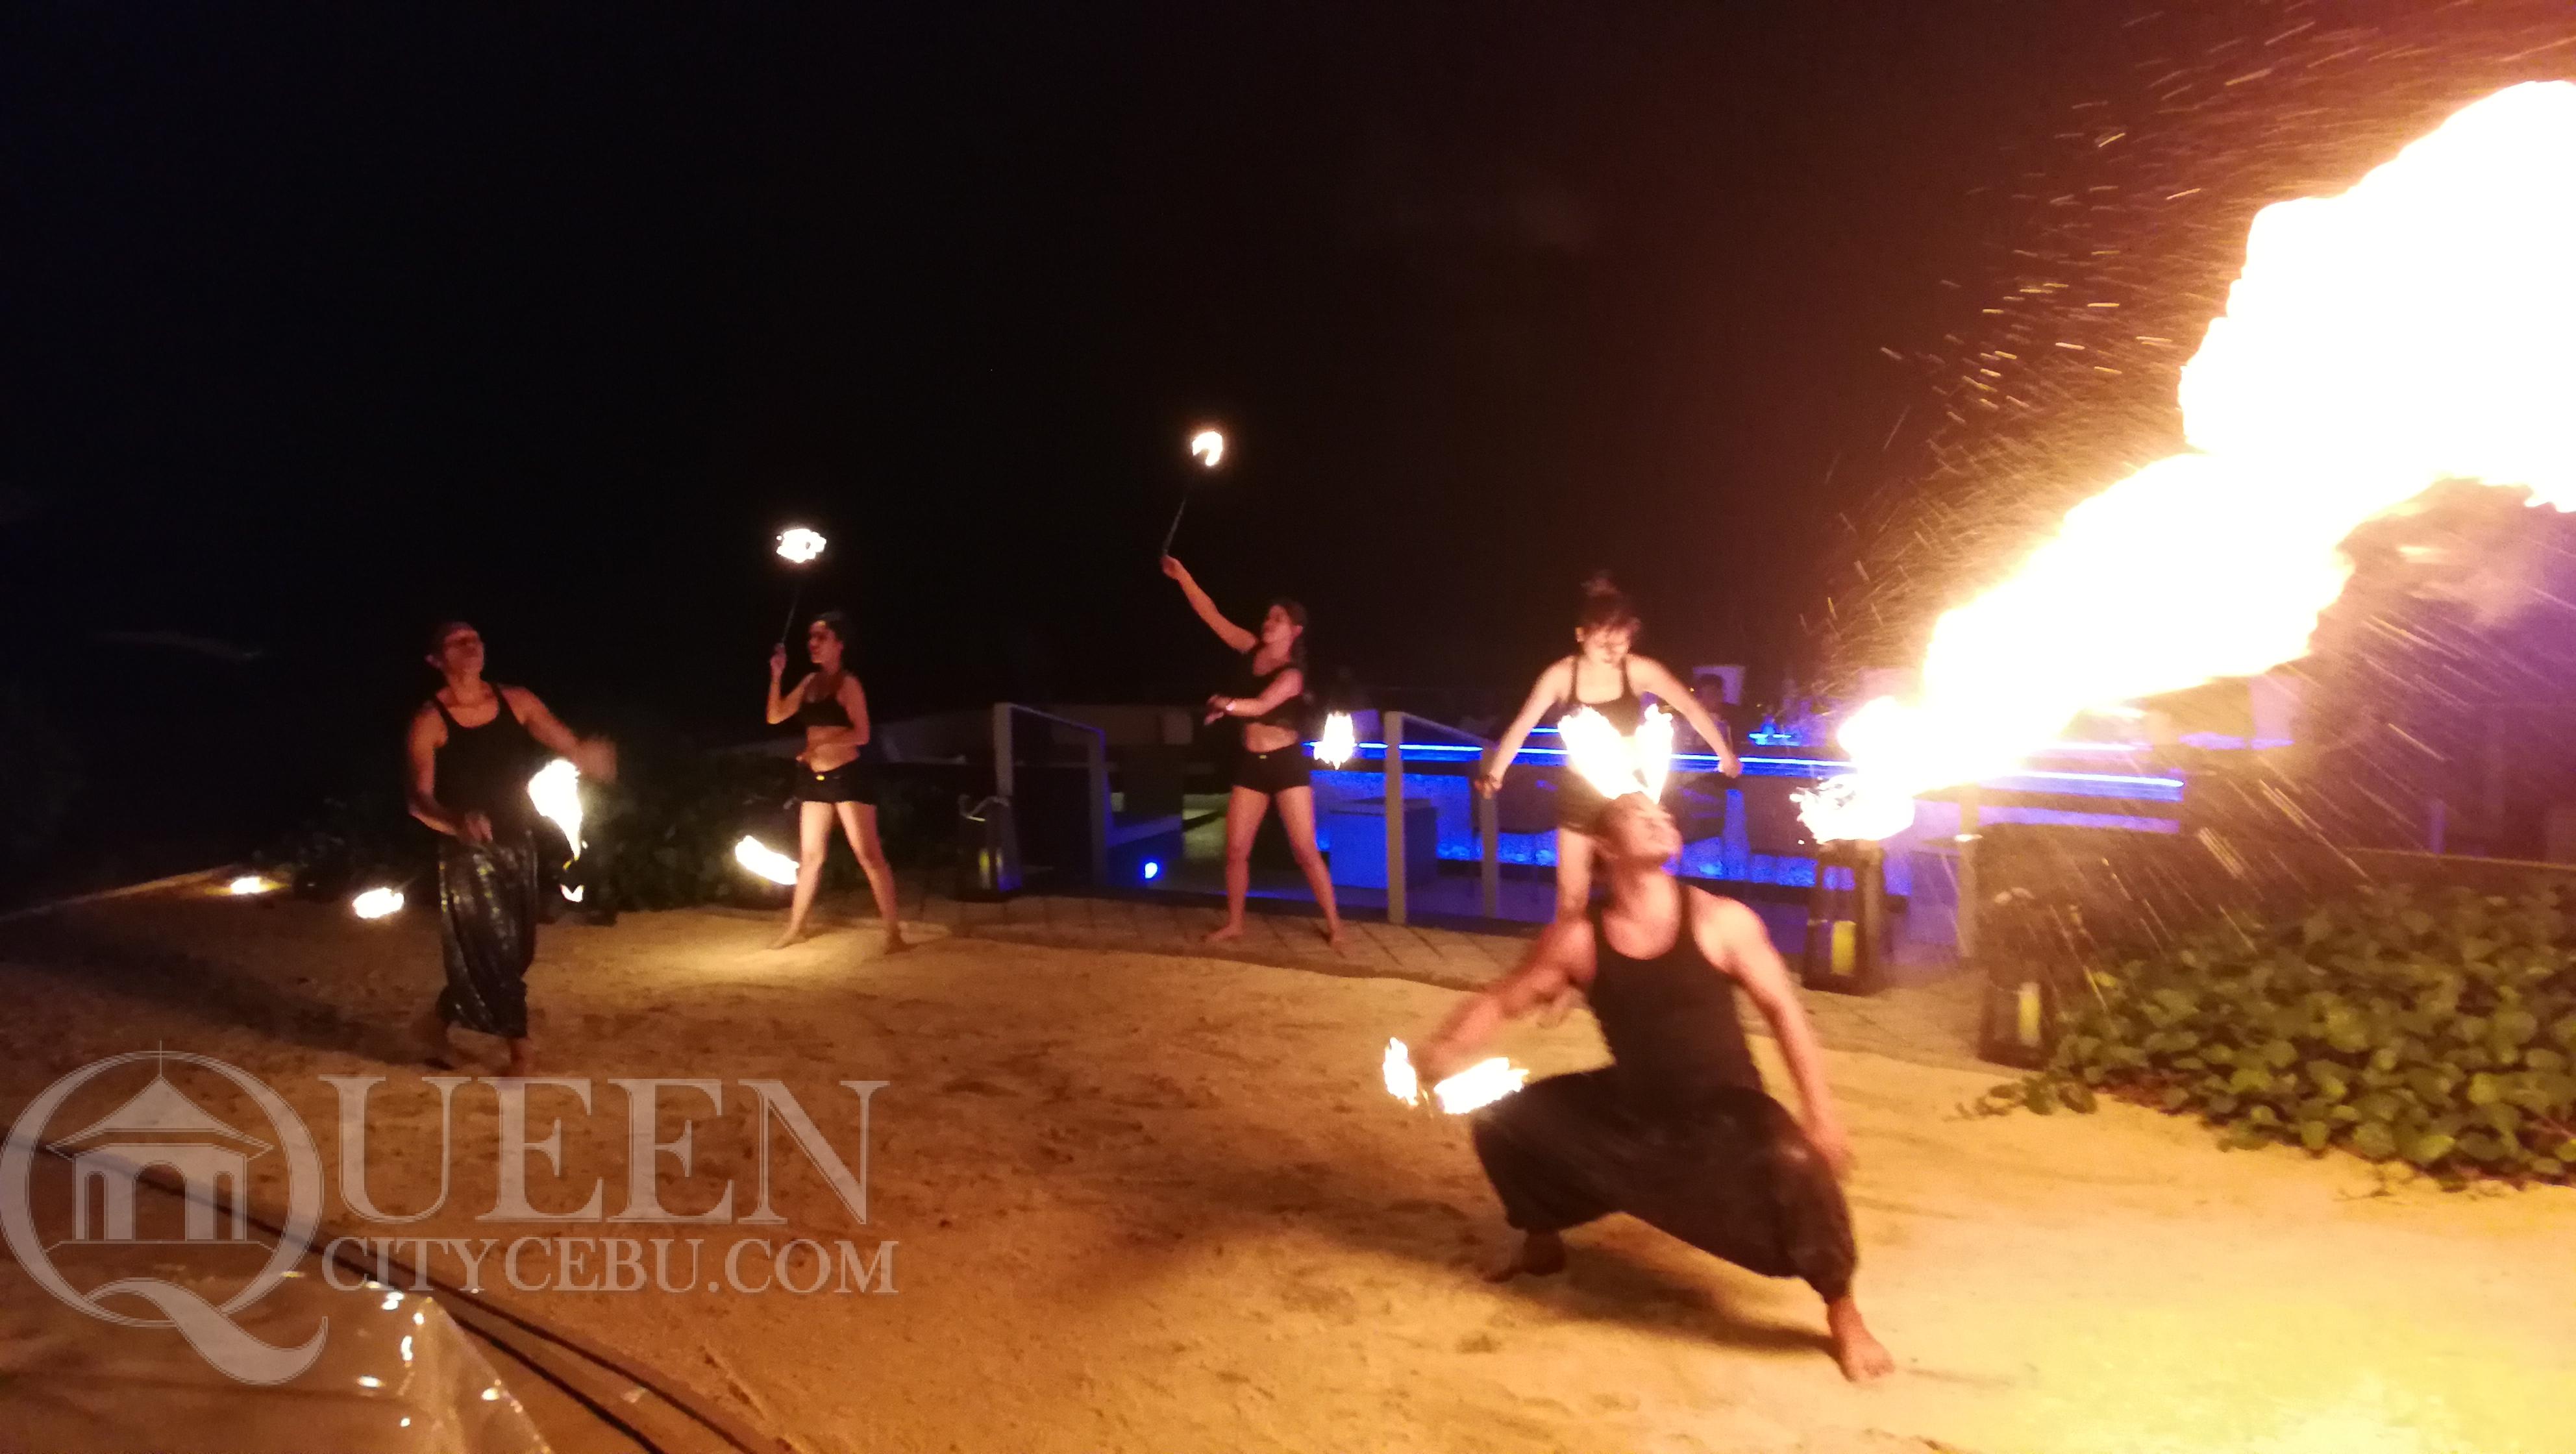 Fire dance performance at Crimson Resort